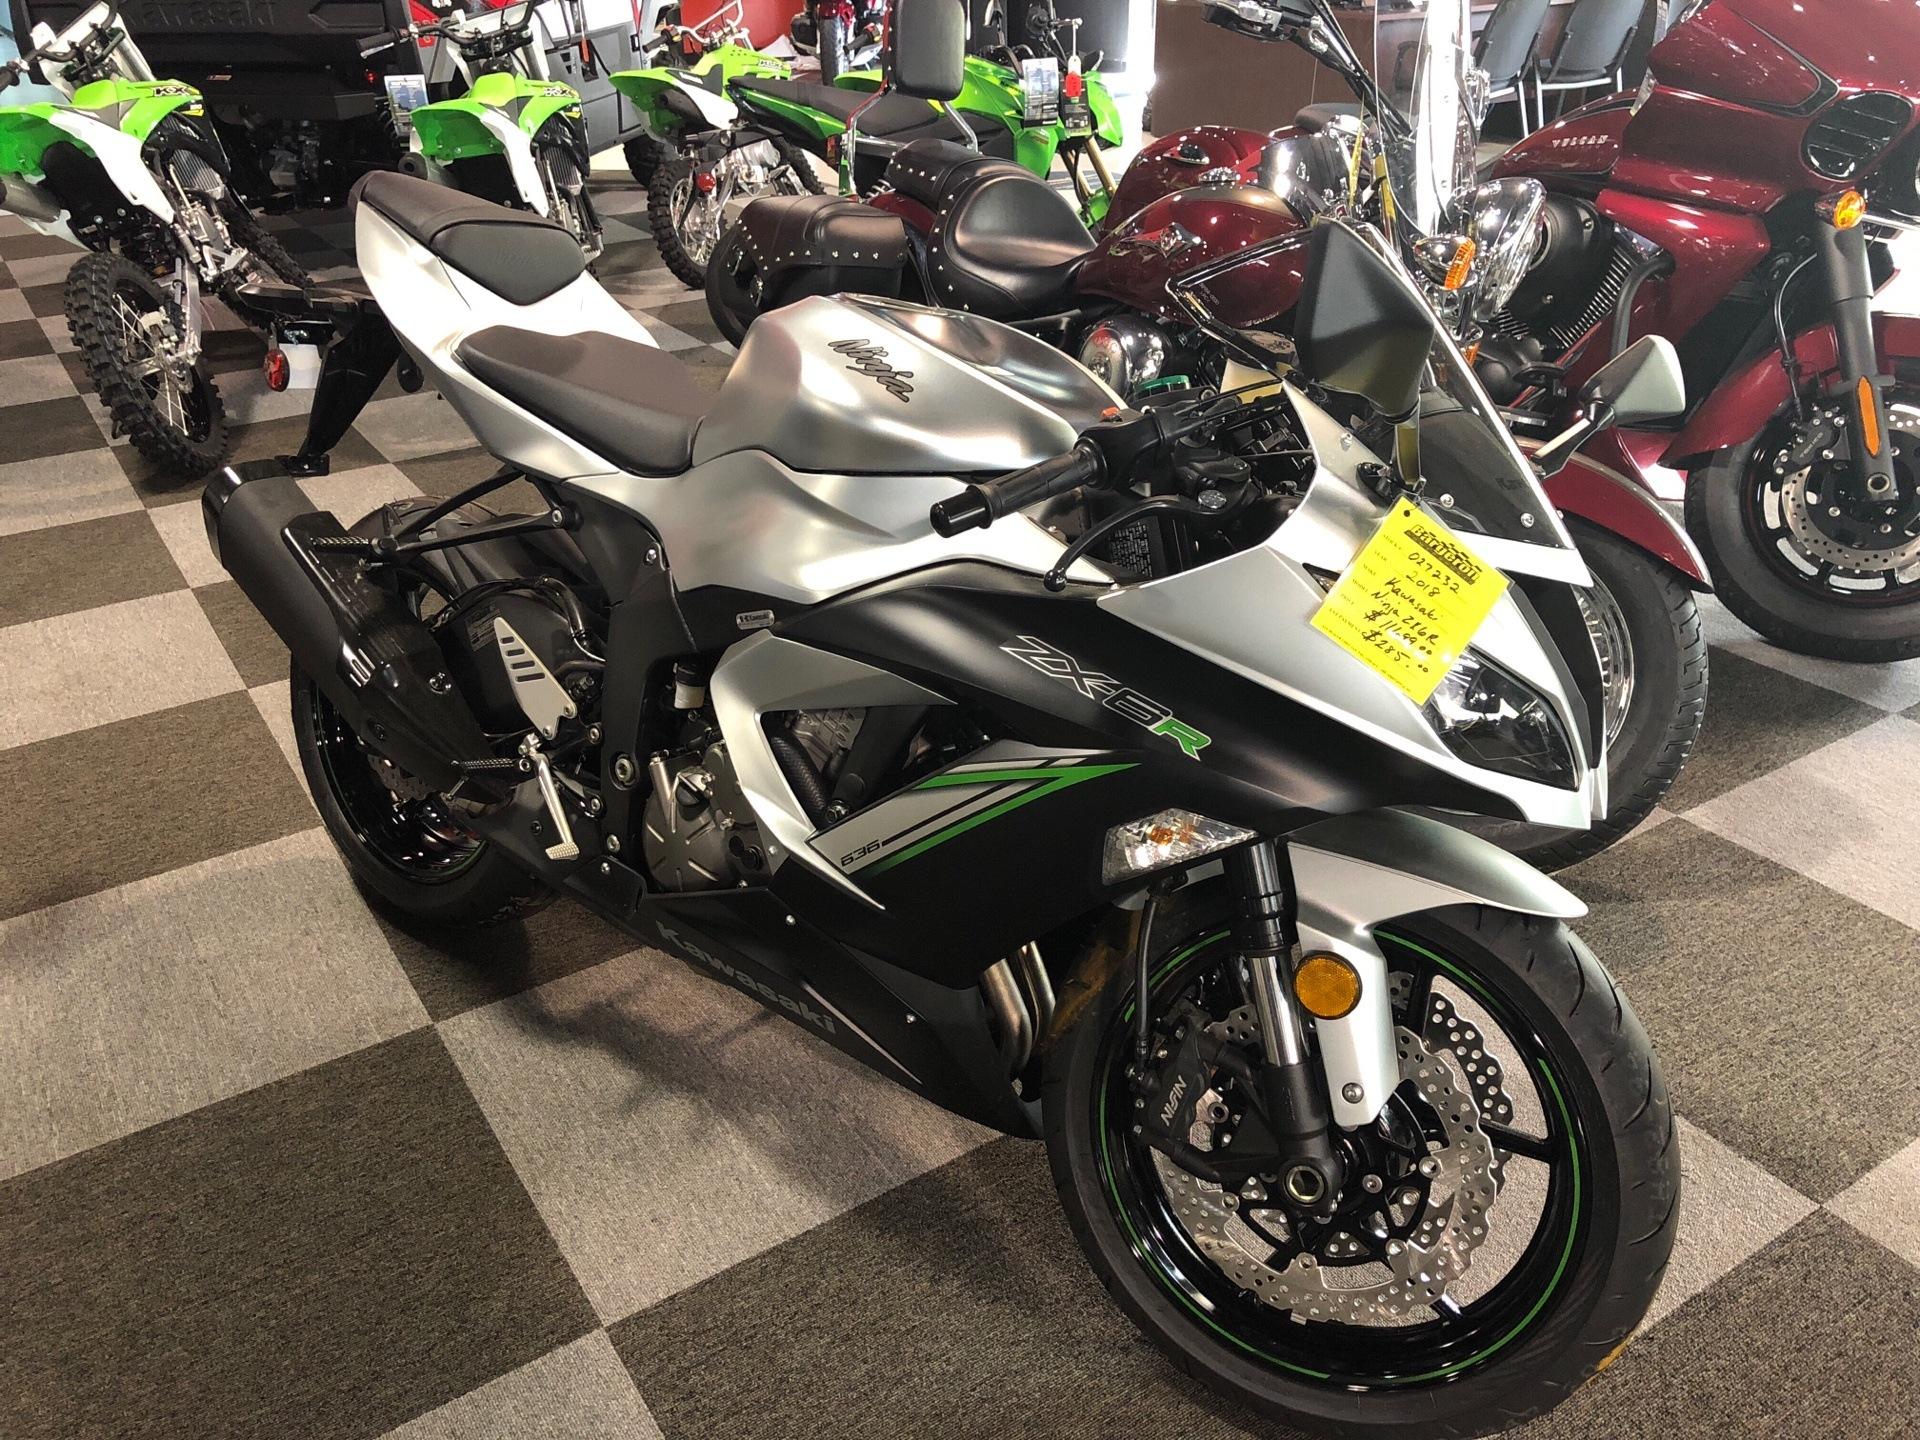 2018 Kawasaki Ninja ZX-6R for sale 2220